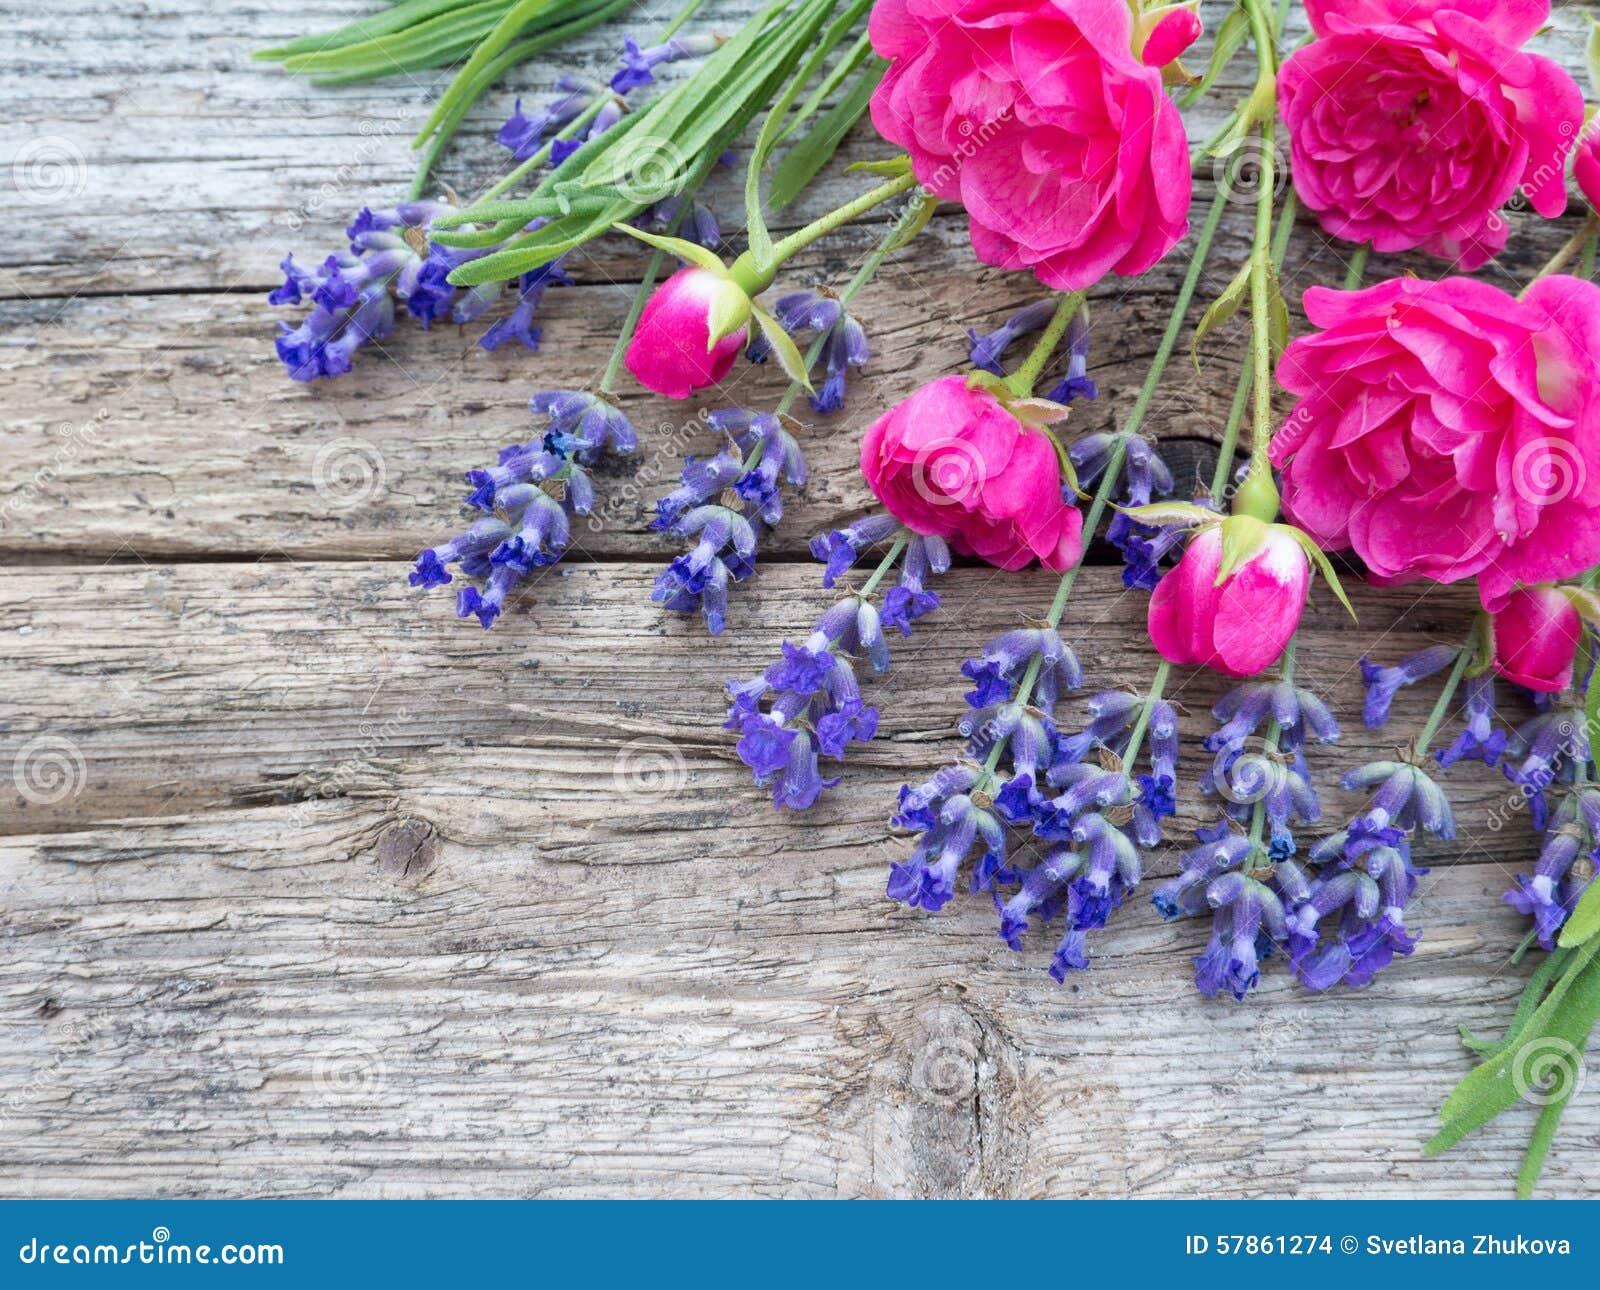 kleine vibrierende rosa rosen und provence lavendel auf. Black Bedroom Furniture Sets. Home Design Ideas